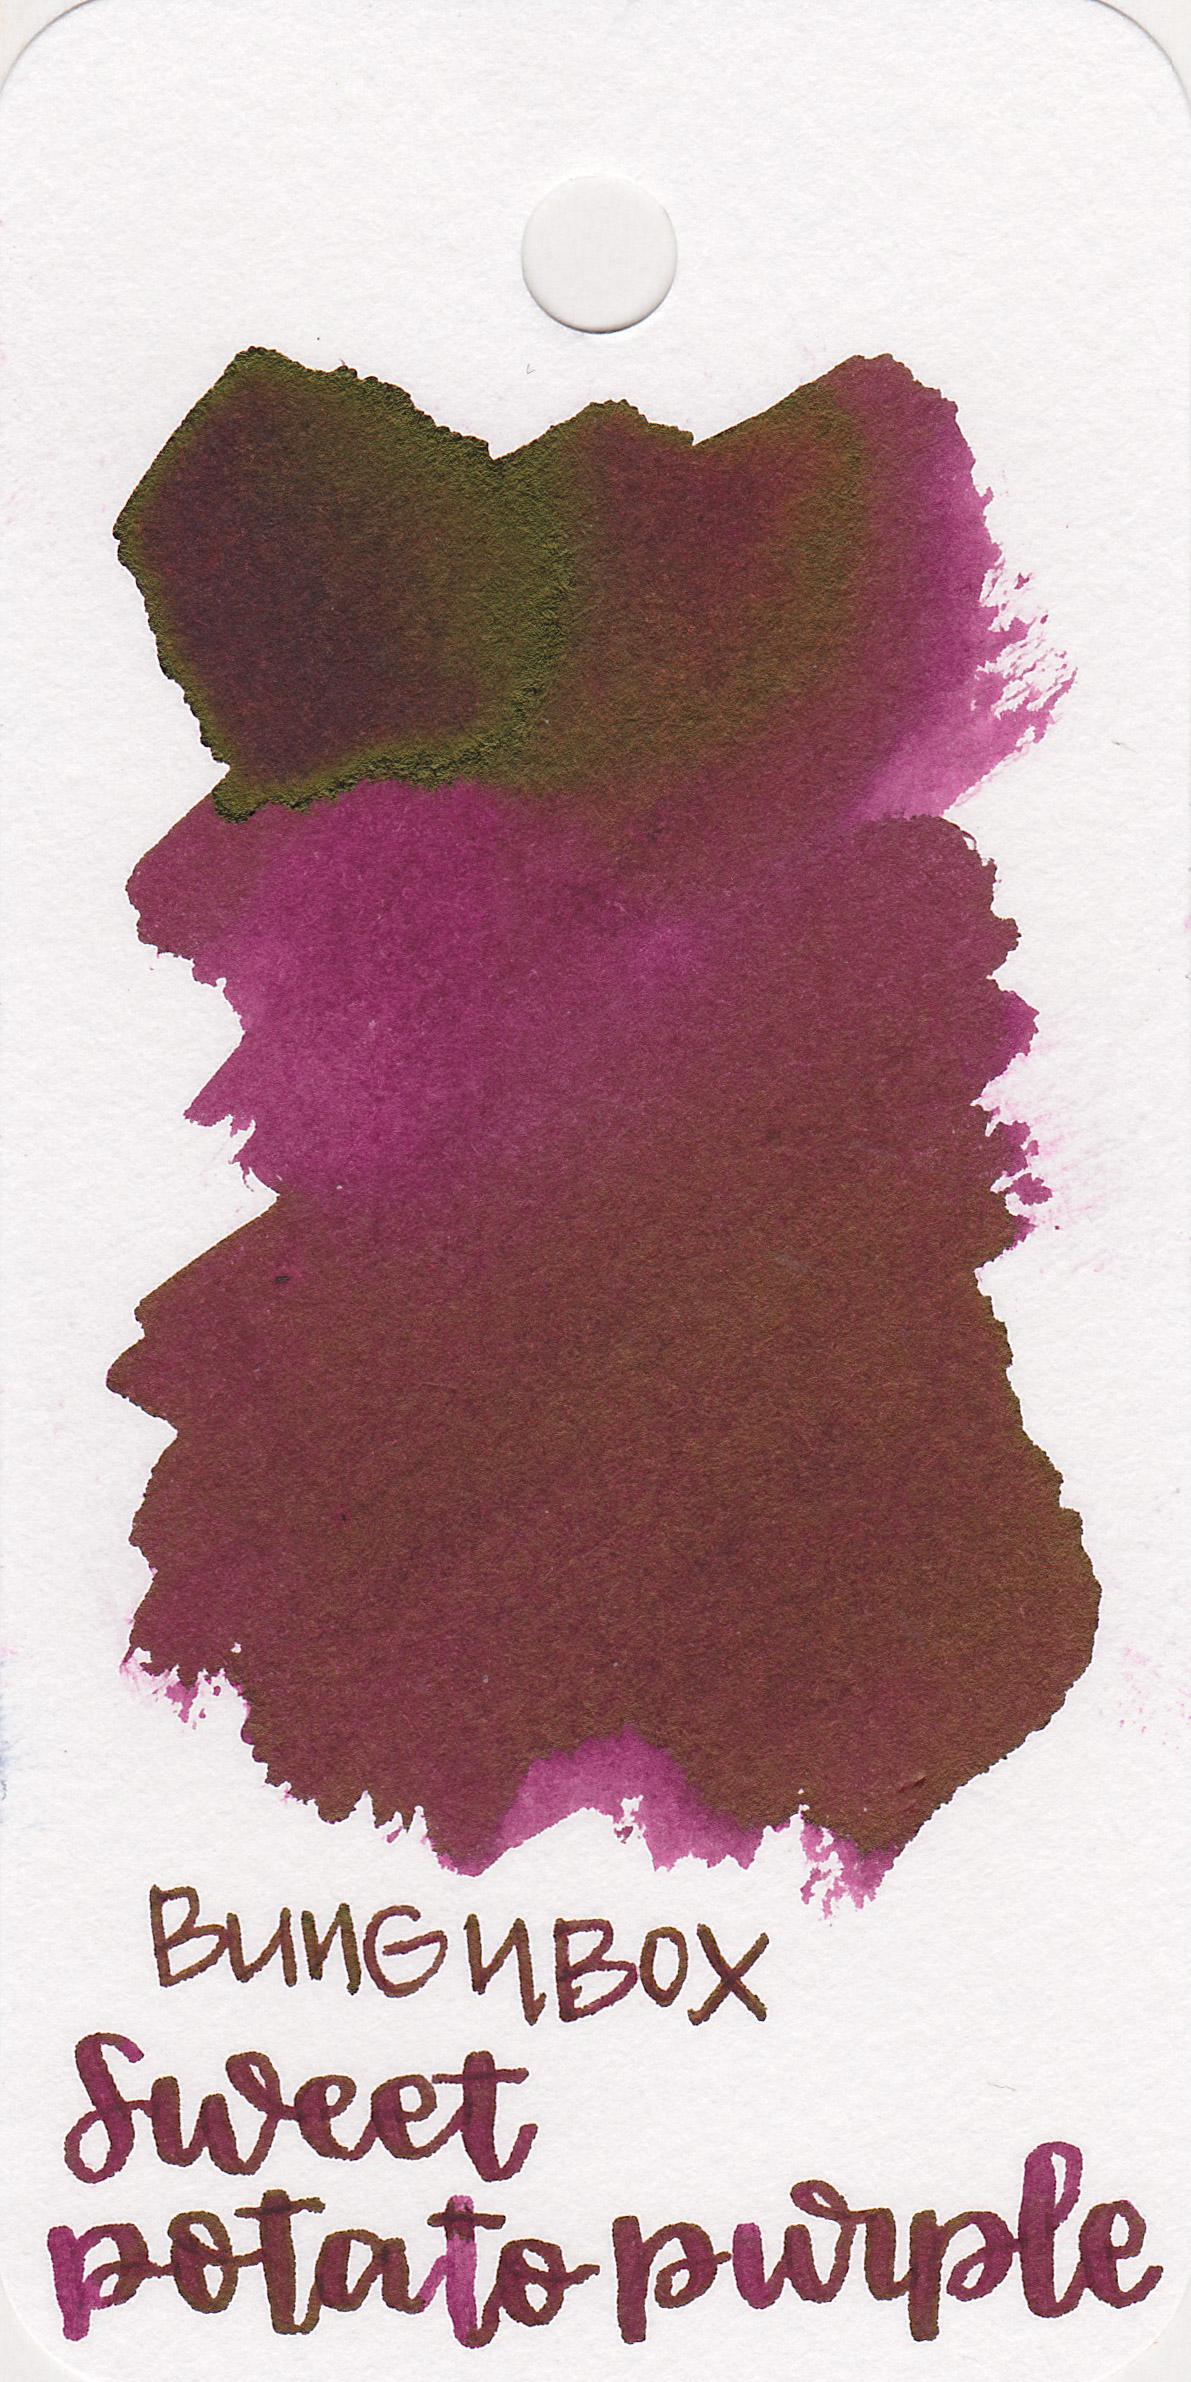 The color: - Sweet Potato Purple is a dark fuchsia purple.